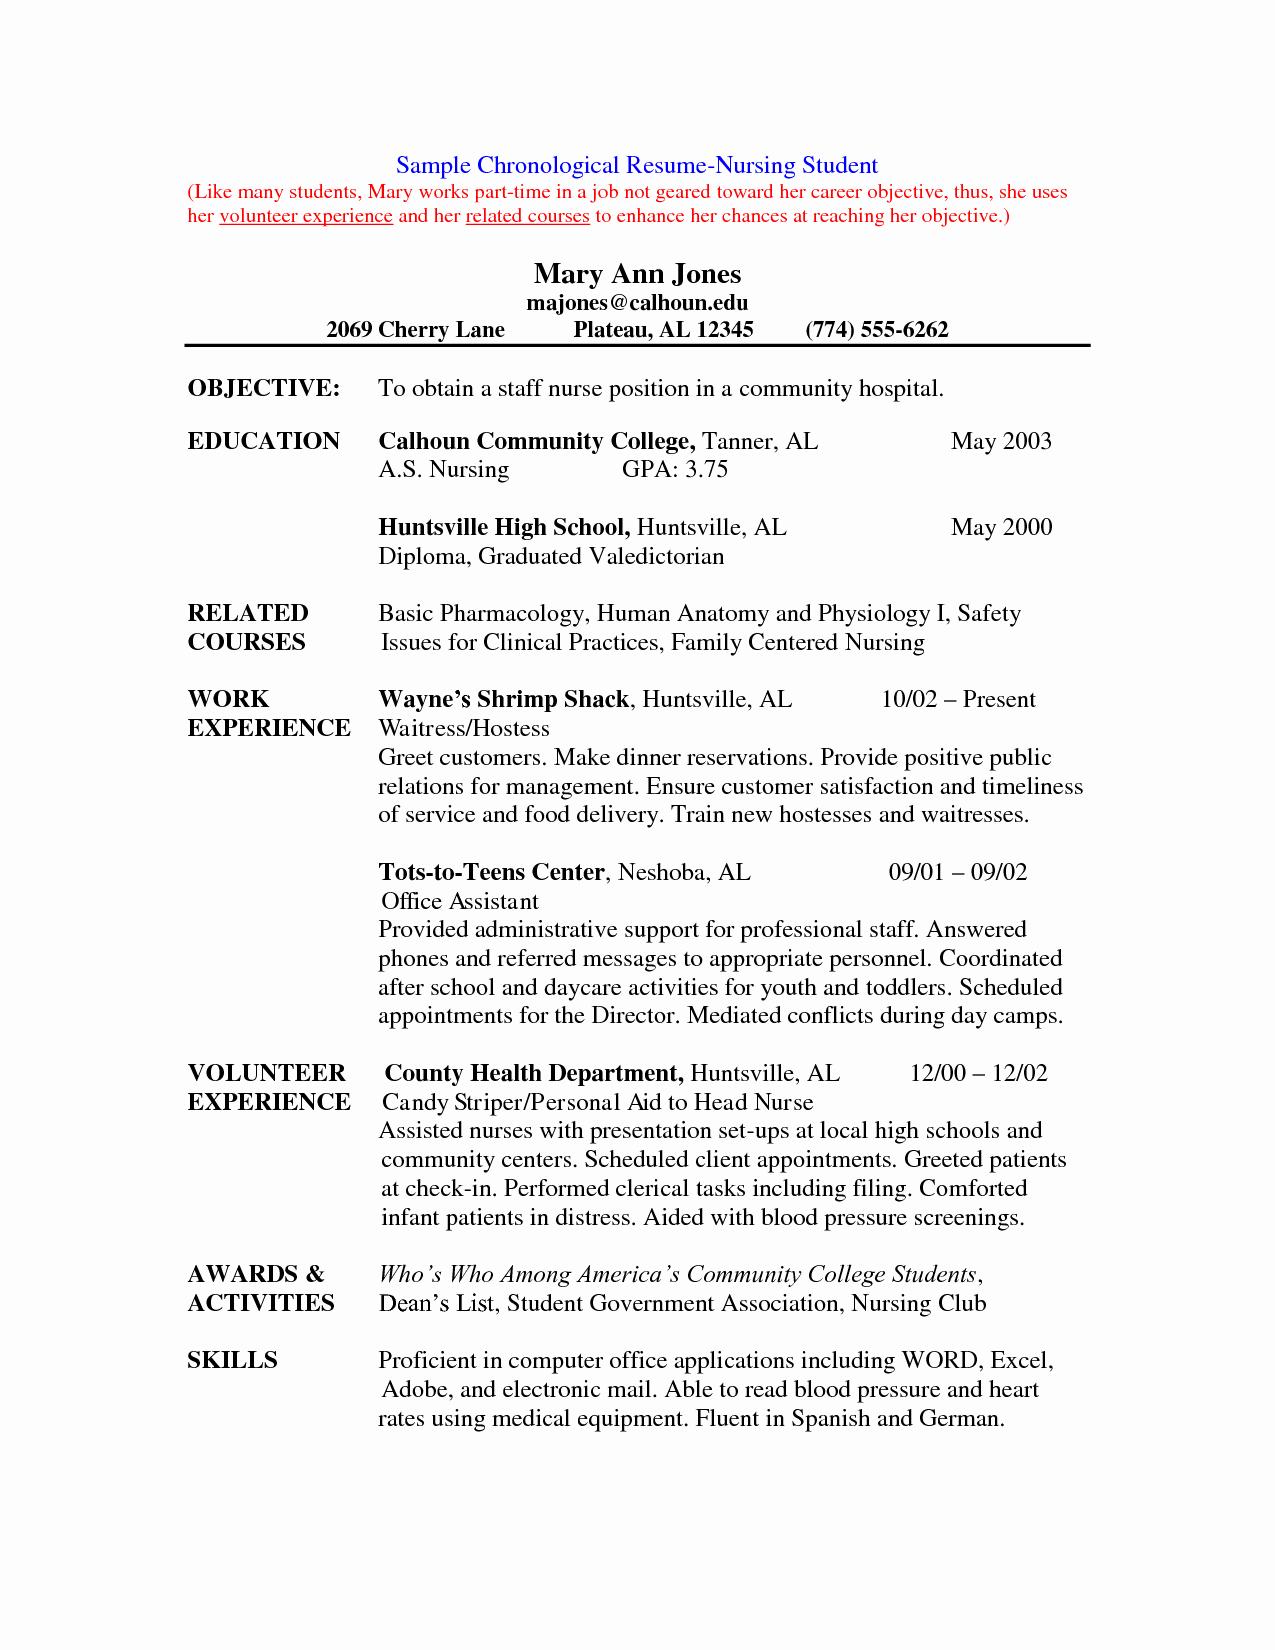 Nursing Student Resume Template Beautiful Nursing Student Resume